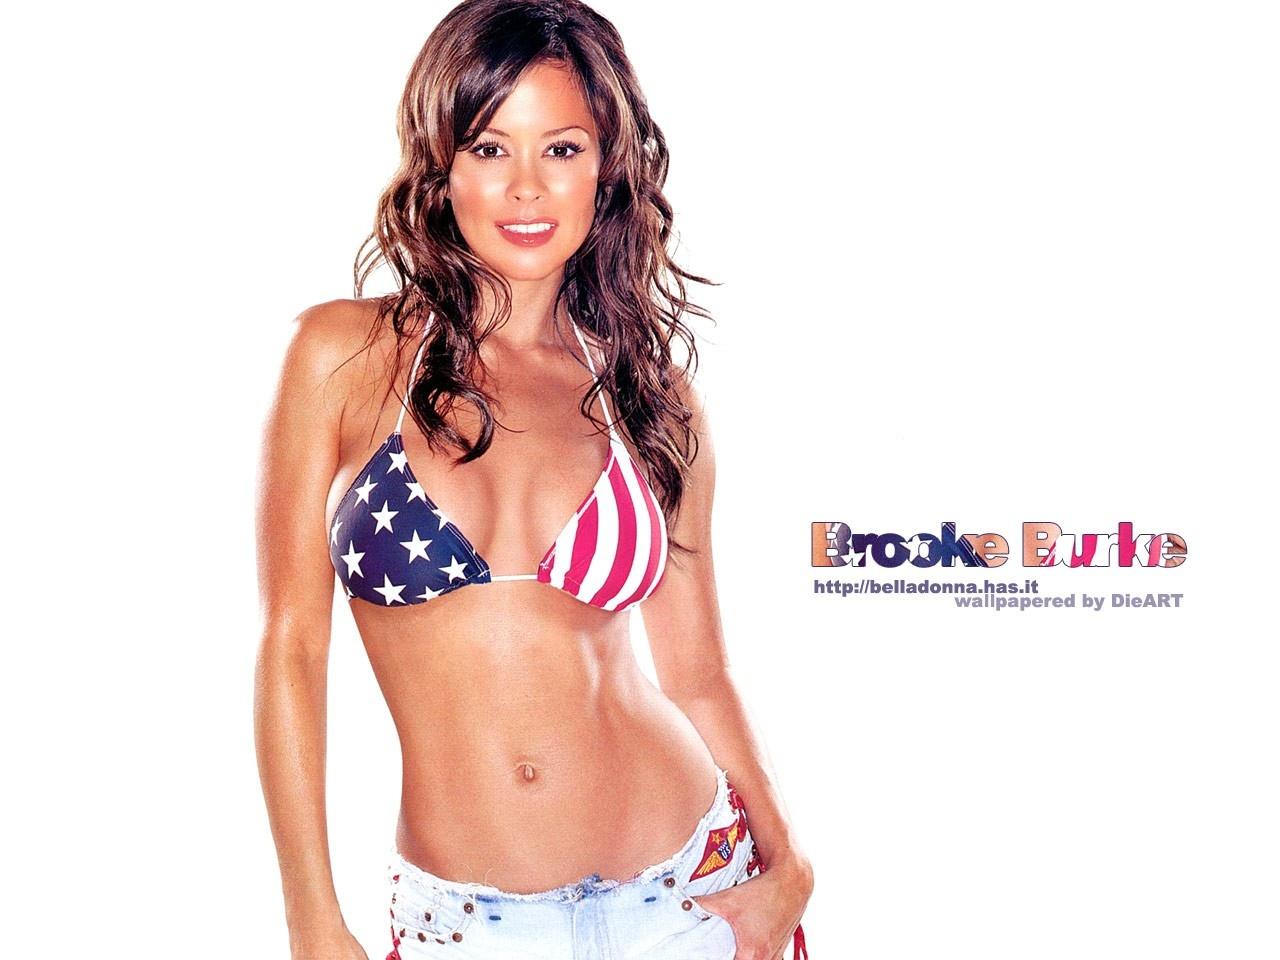 http://1.bp.blogspot.com/-wSXi1p9DJc0/TZGfwKThkVI/AAAAAAAABbI/s_fSf0SAPsw/s1600/Brooke-Burke-336.jpg